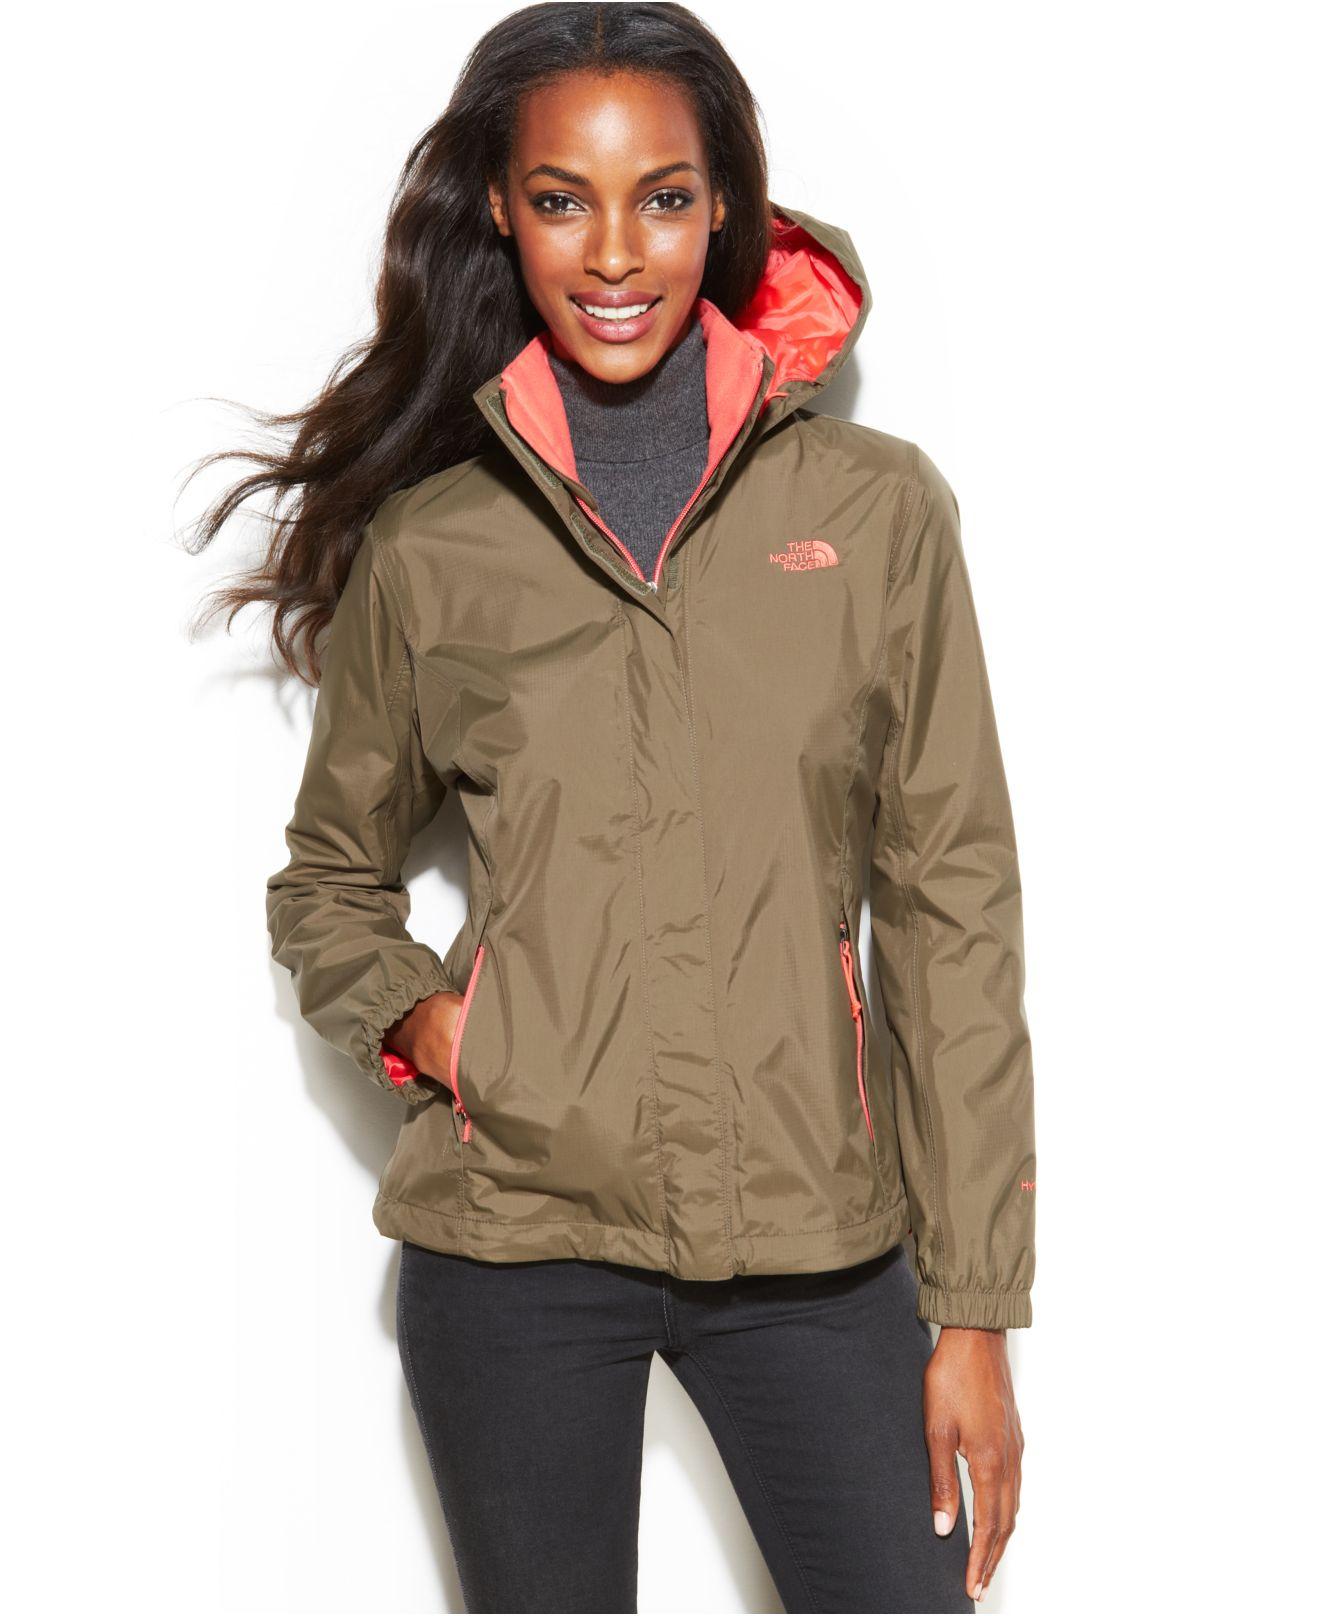 Macys womens jackets